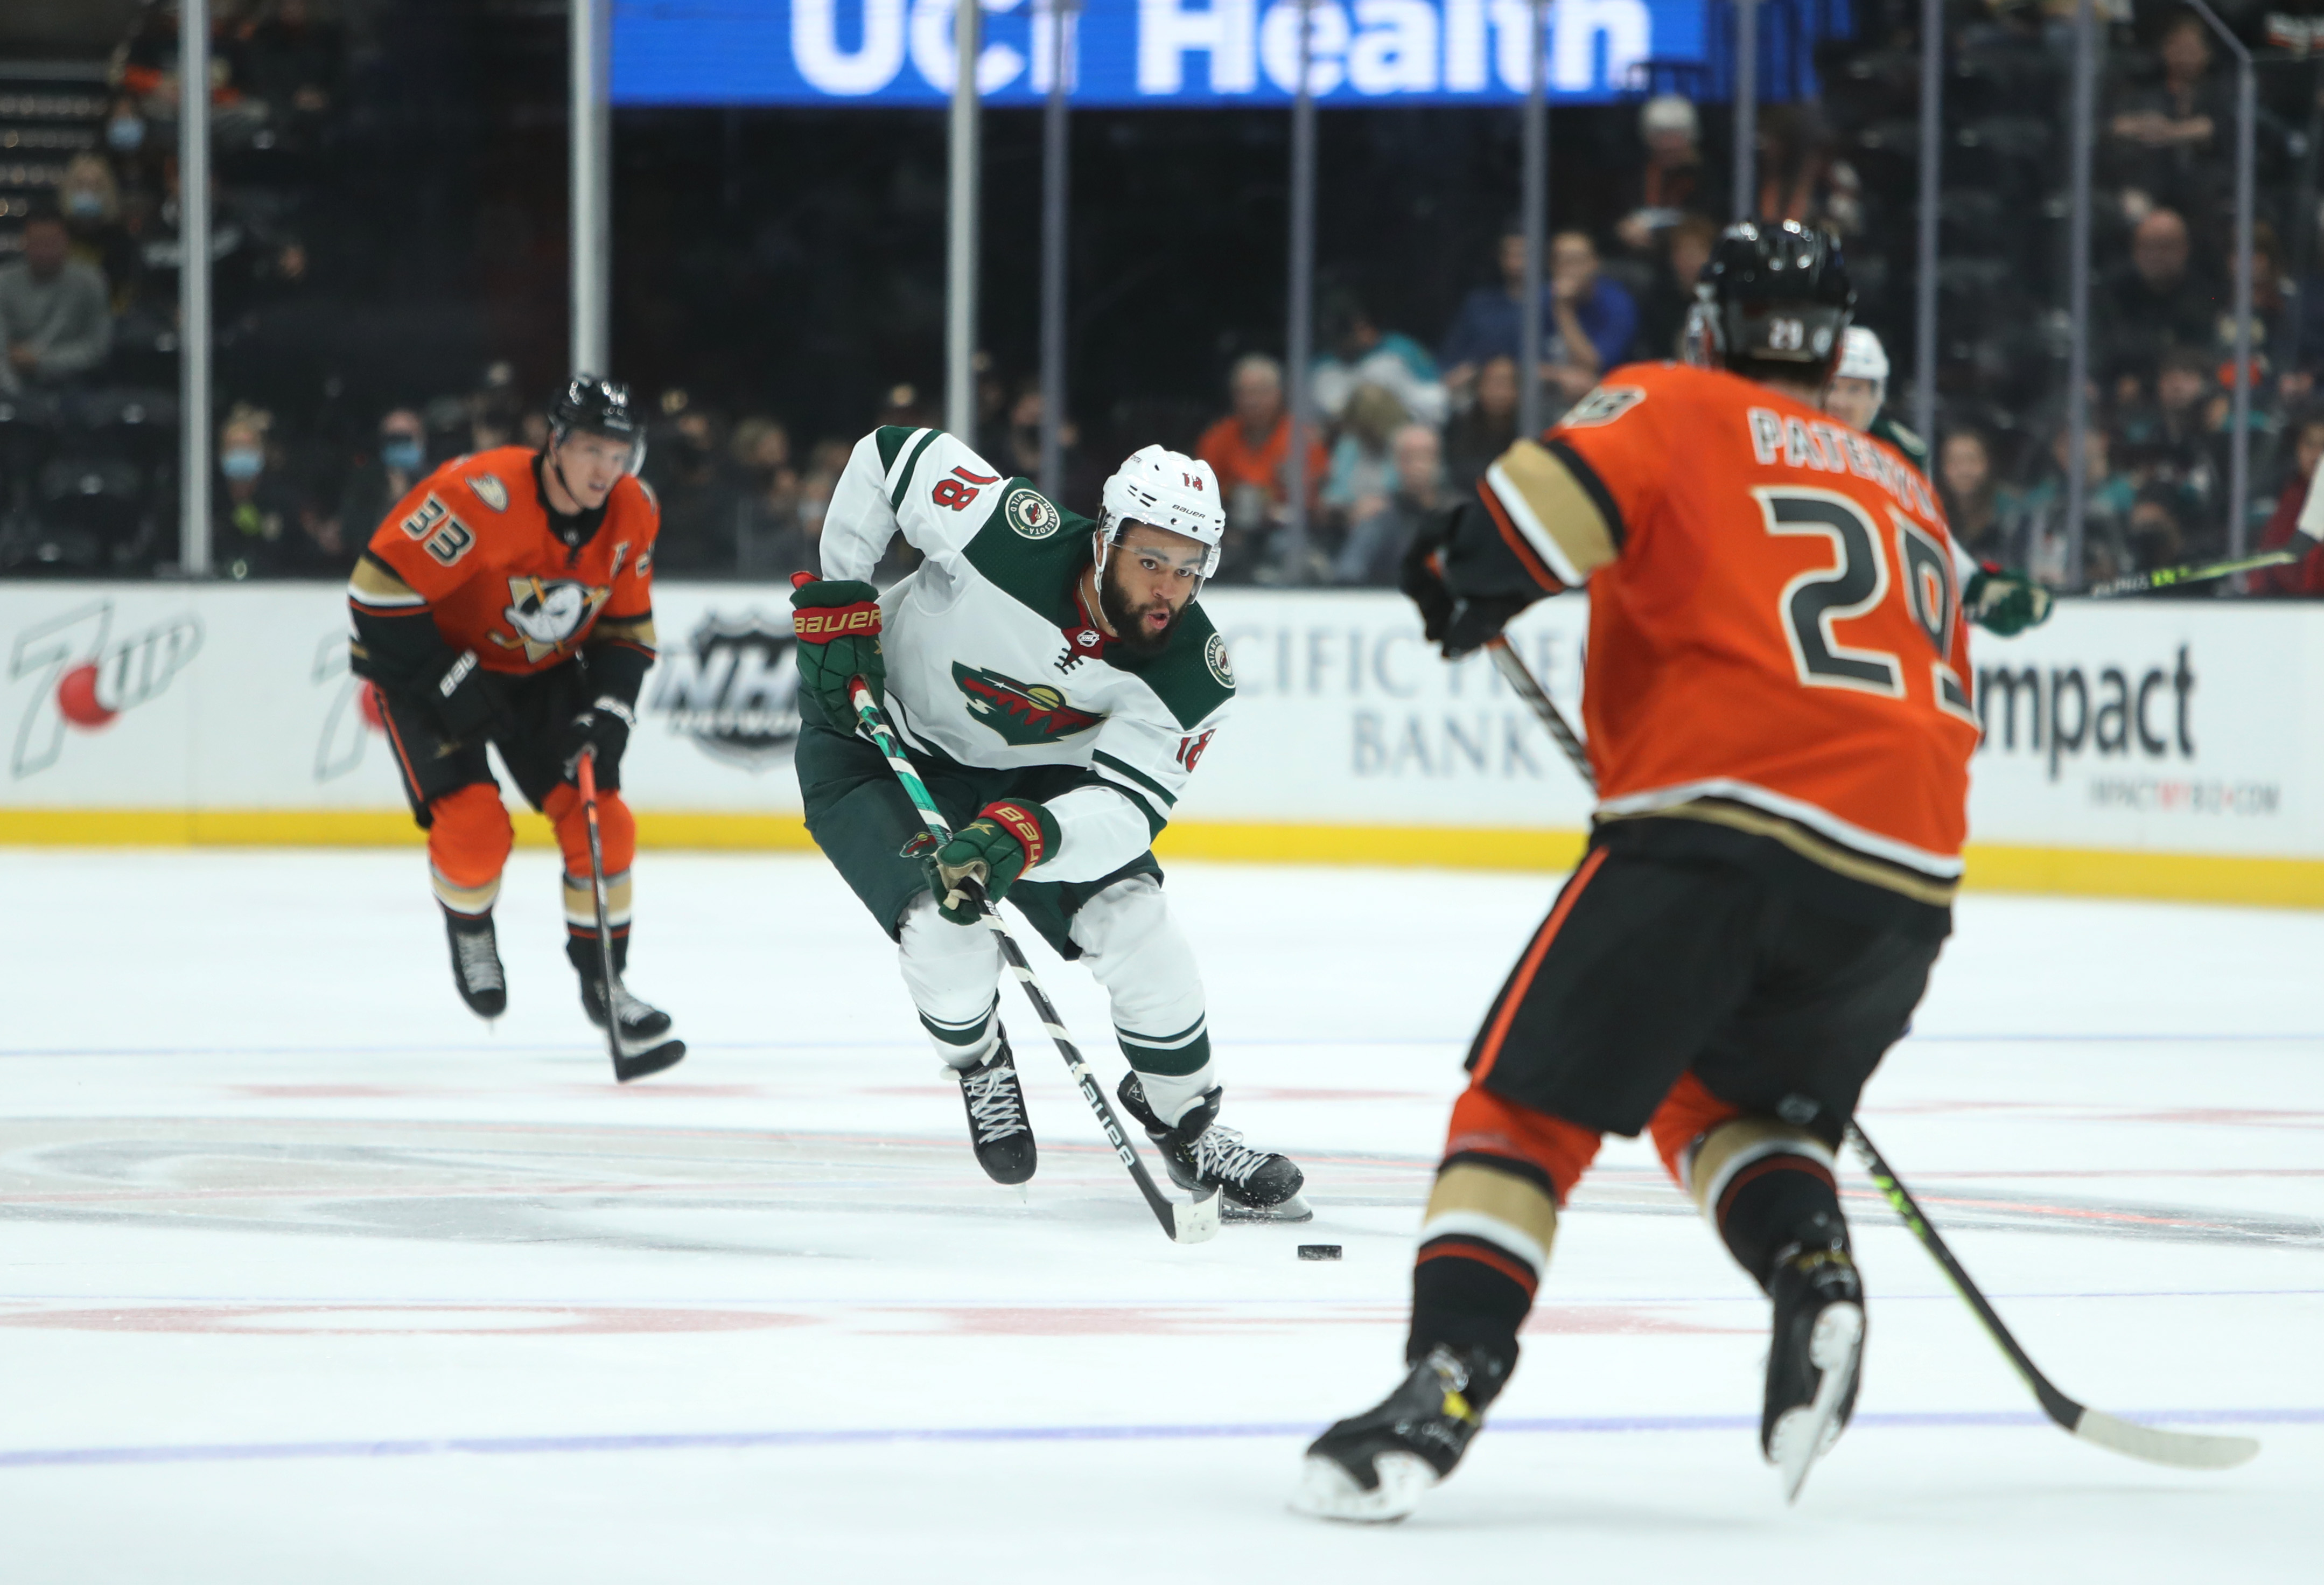 Game Preview: Minnesota Wild vs. Anaheim Ducks 10/23/21 @ 5:00PM CST at Xcel Energy Center